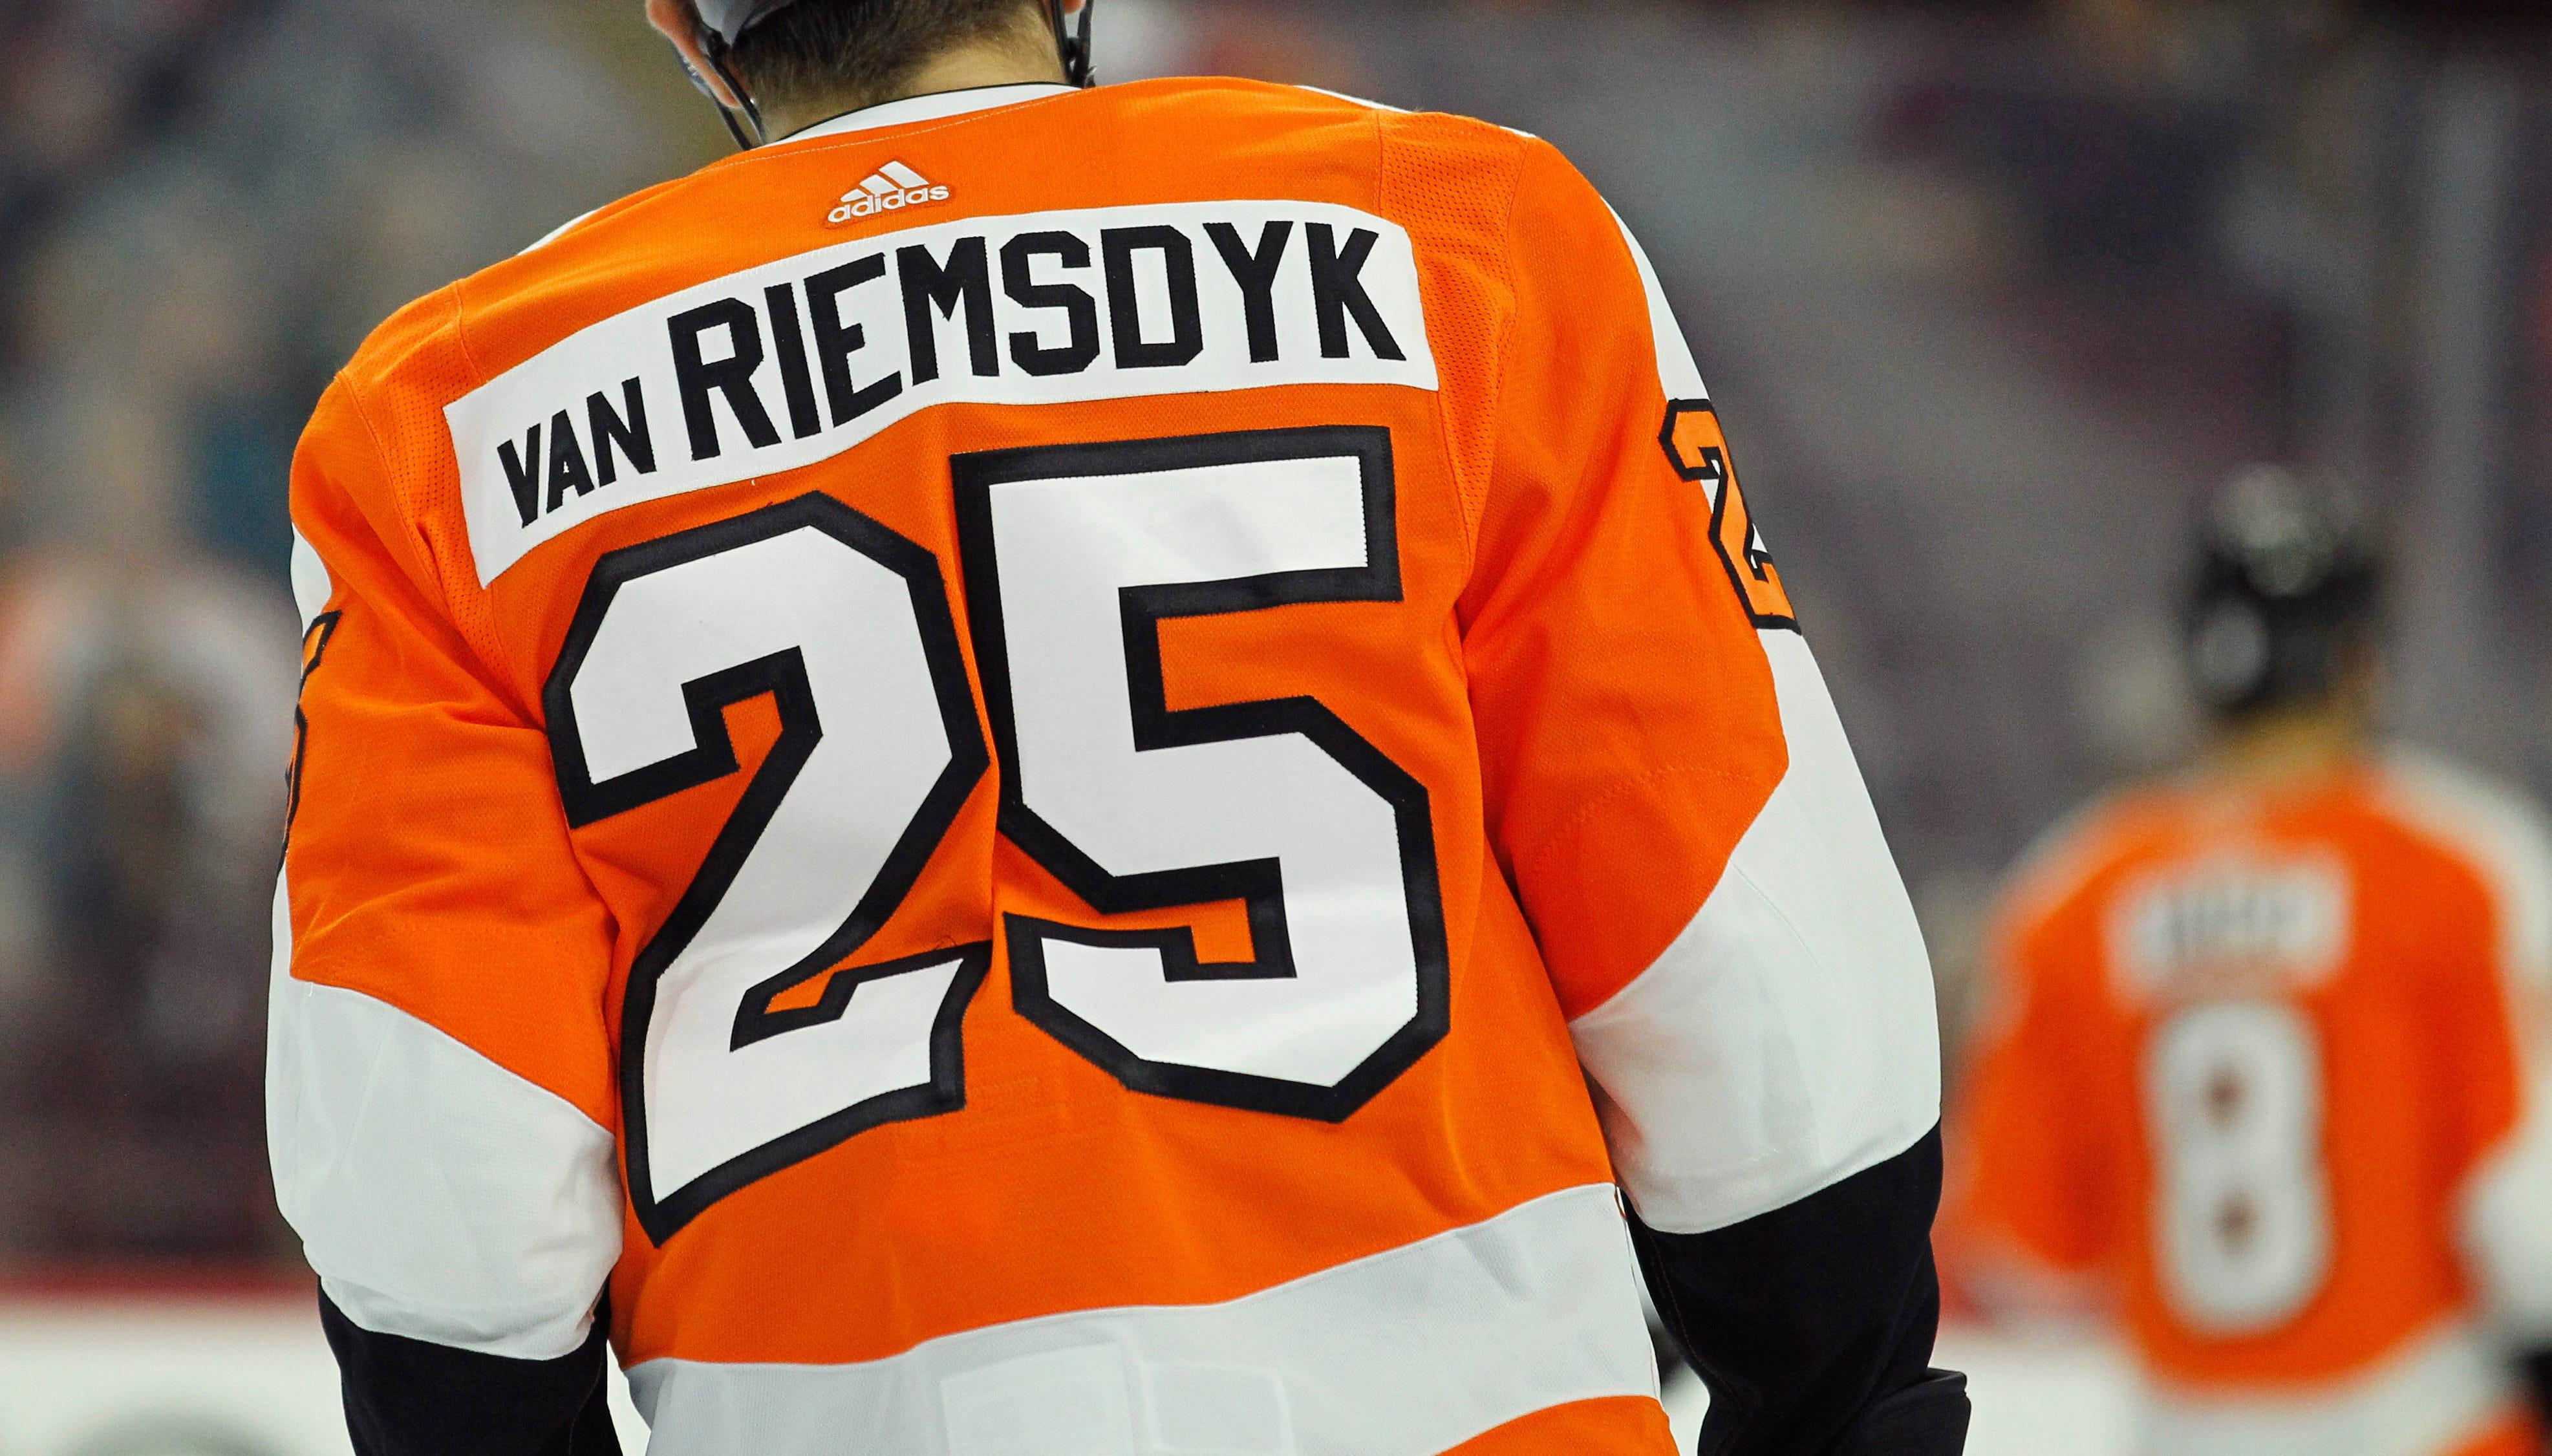 Flyers' James van Riemsdyk out 5-6 weeks, Jordan Weal first up to replace him